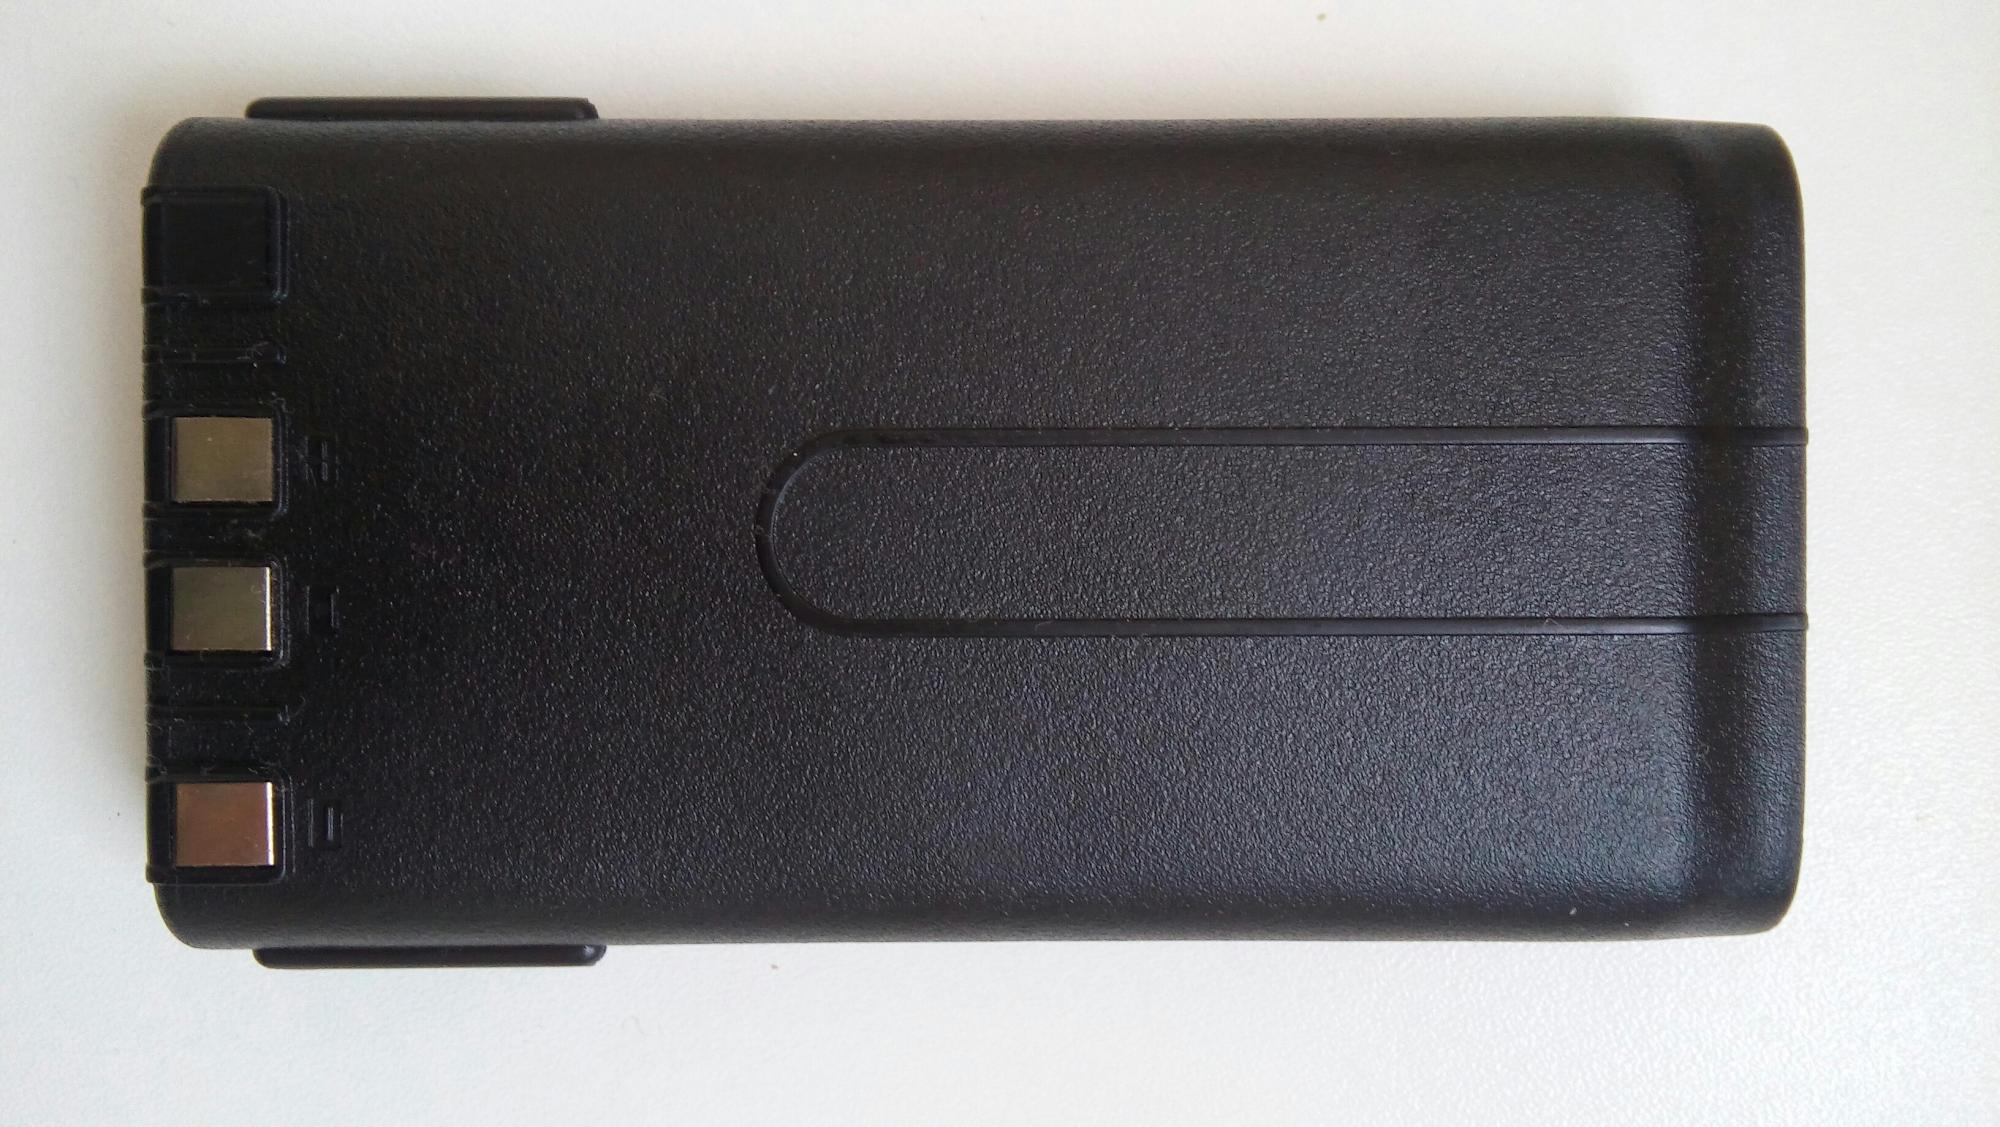 Батареи KNB-15H 2100 мАч для рации. Новые в Самаре